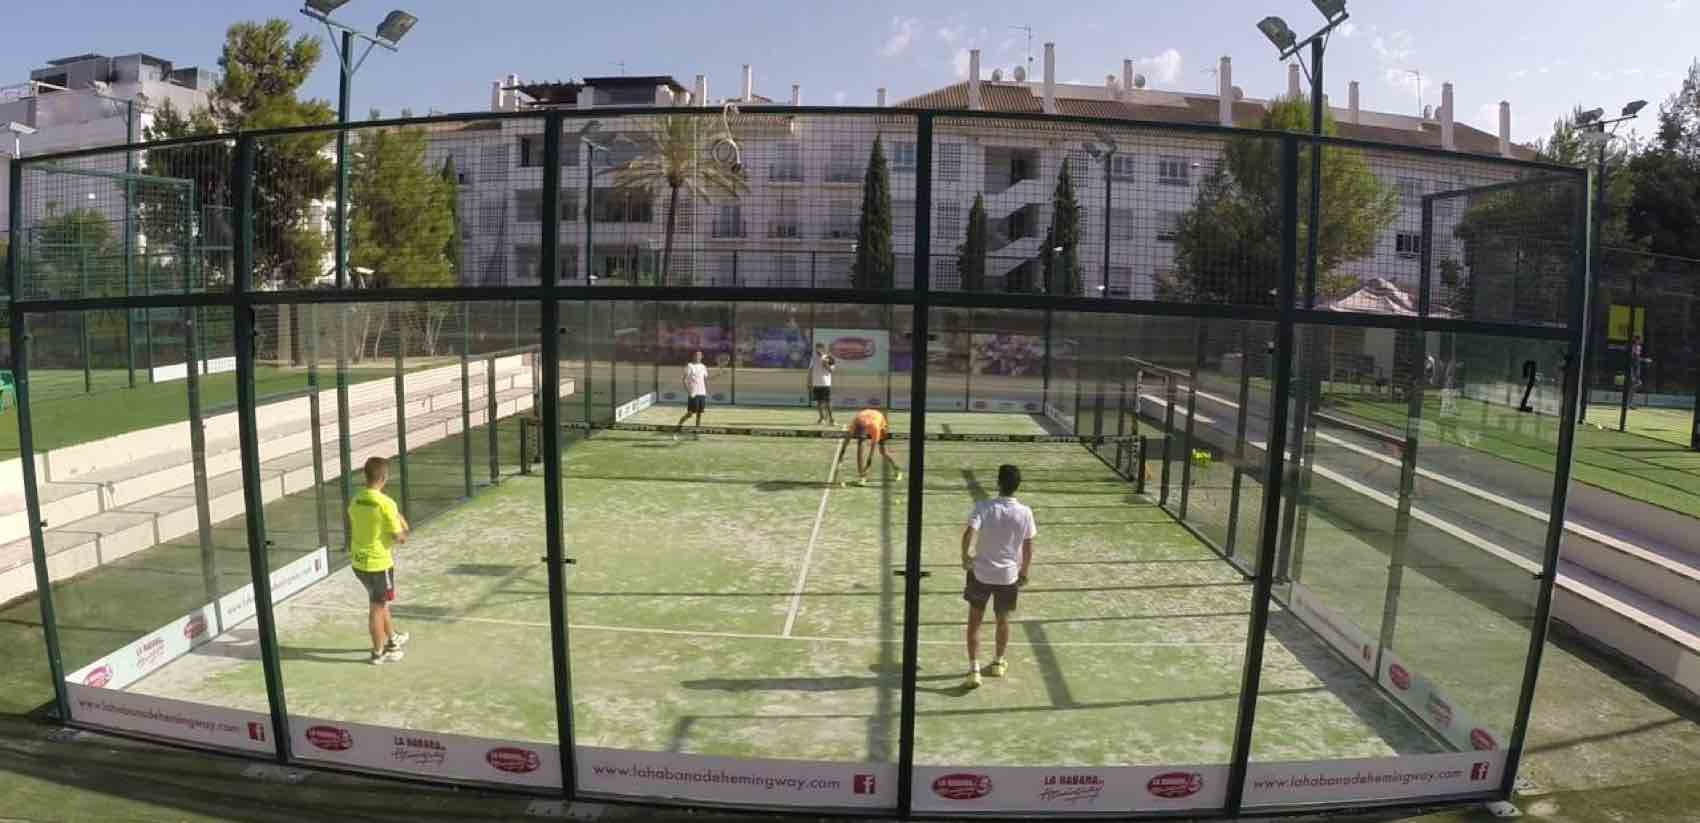 Padel tennis cour at Real Club in Marbella